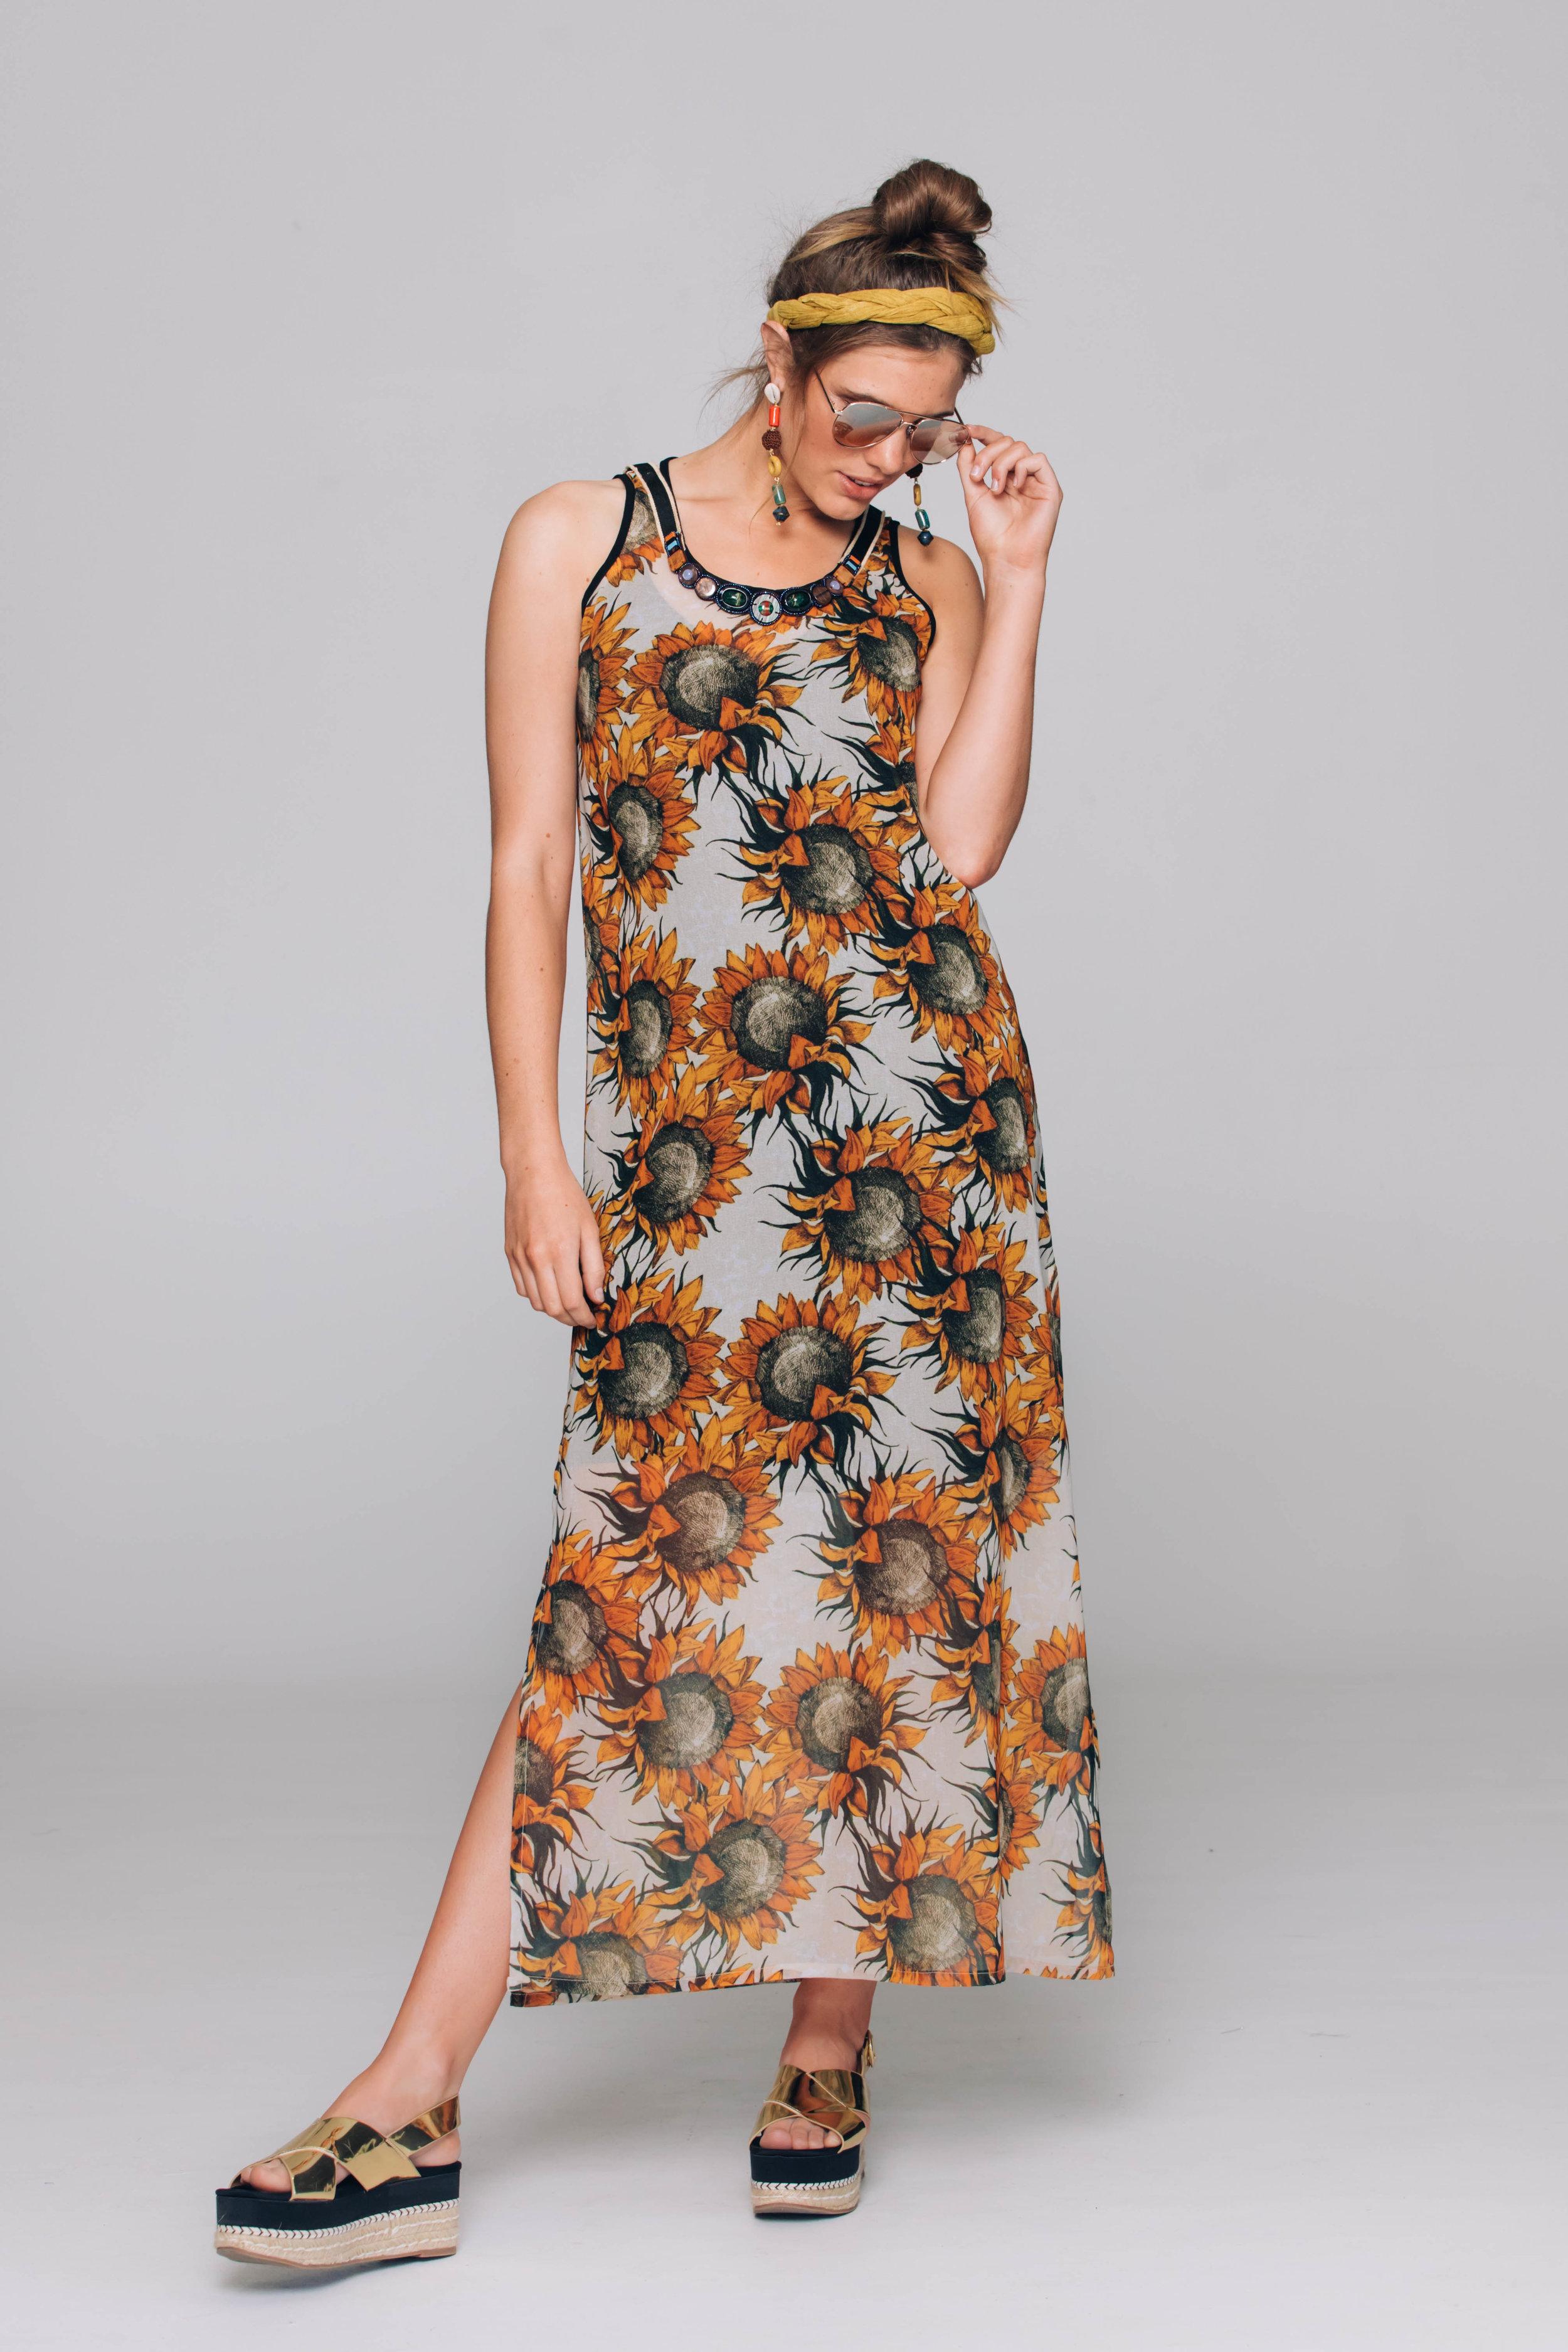 6021T Sunset Dress, Large Sunflowers